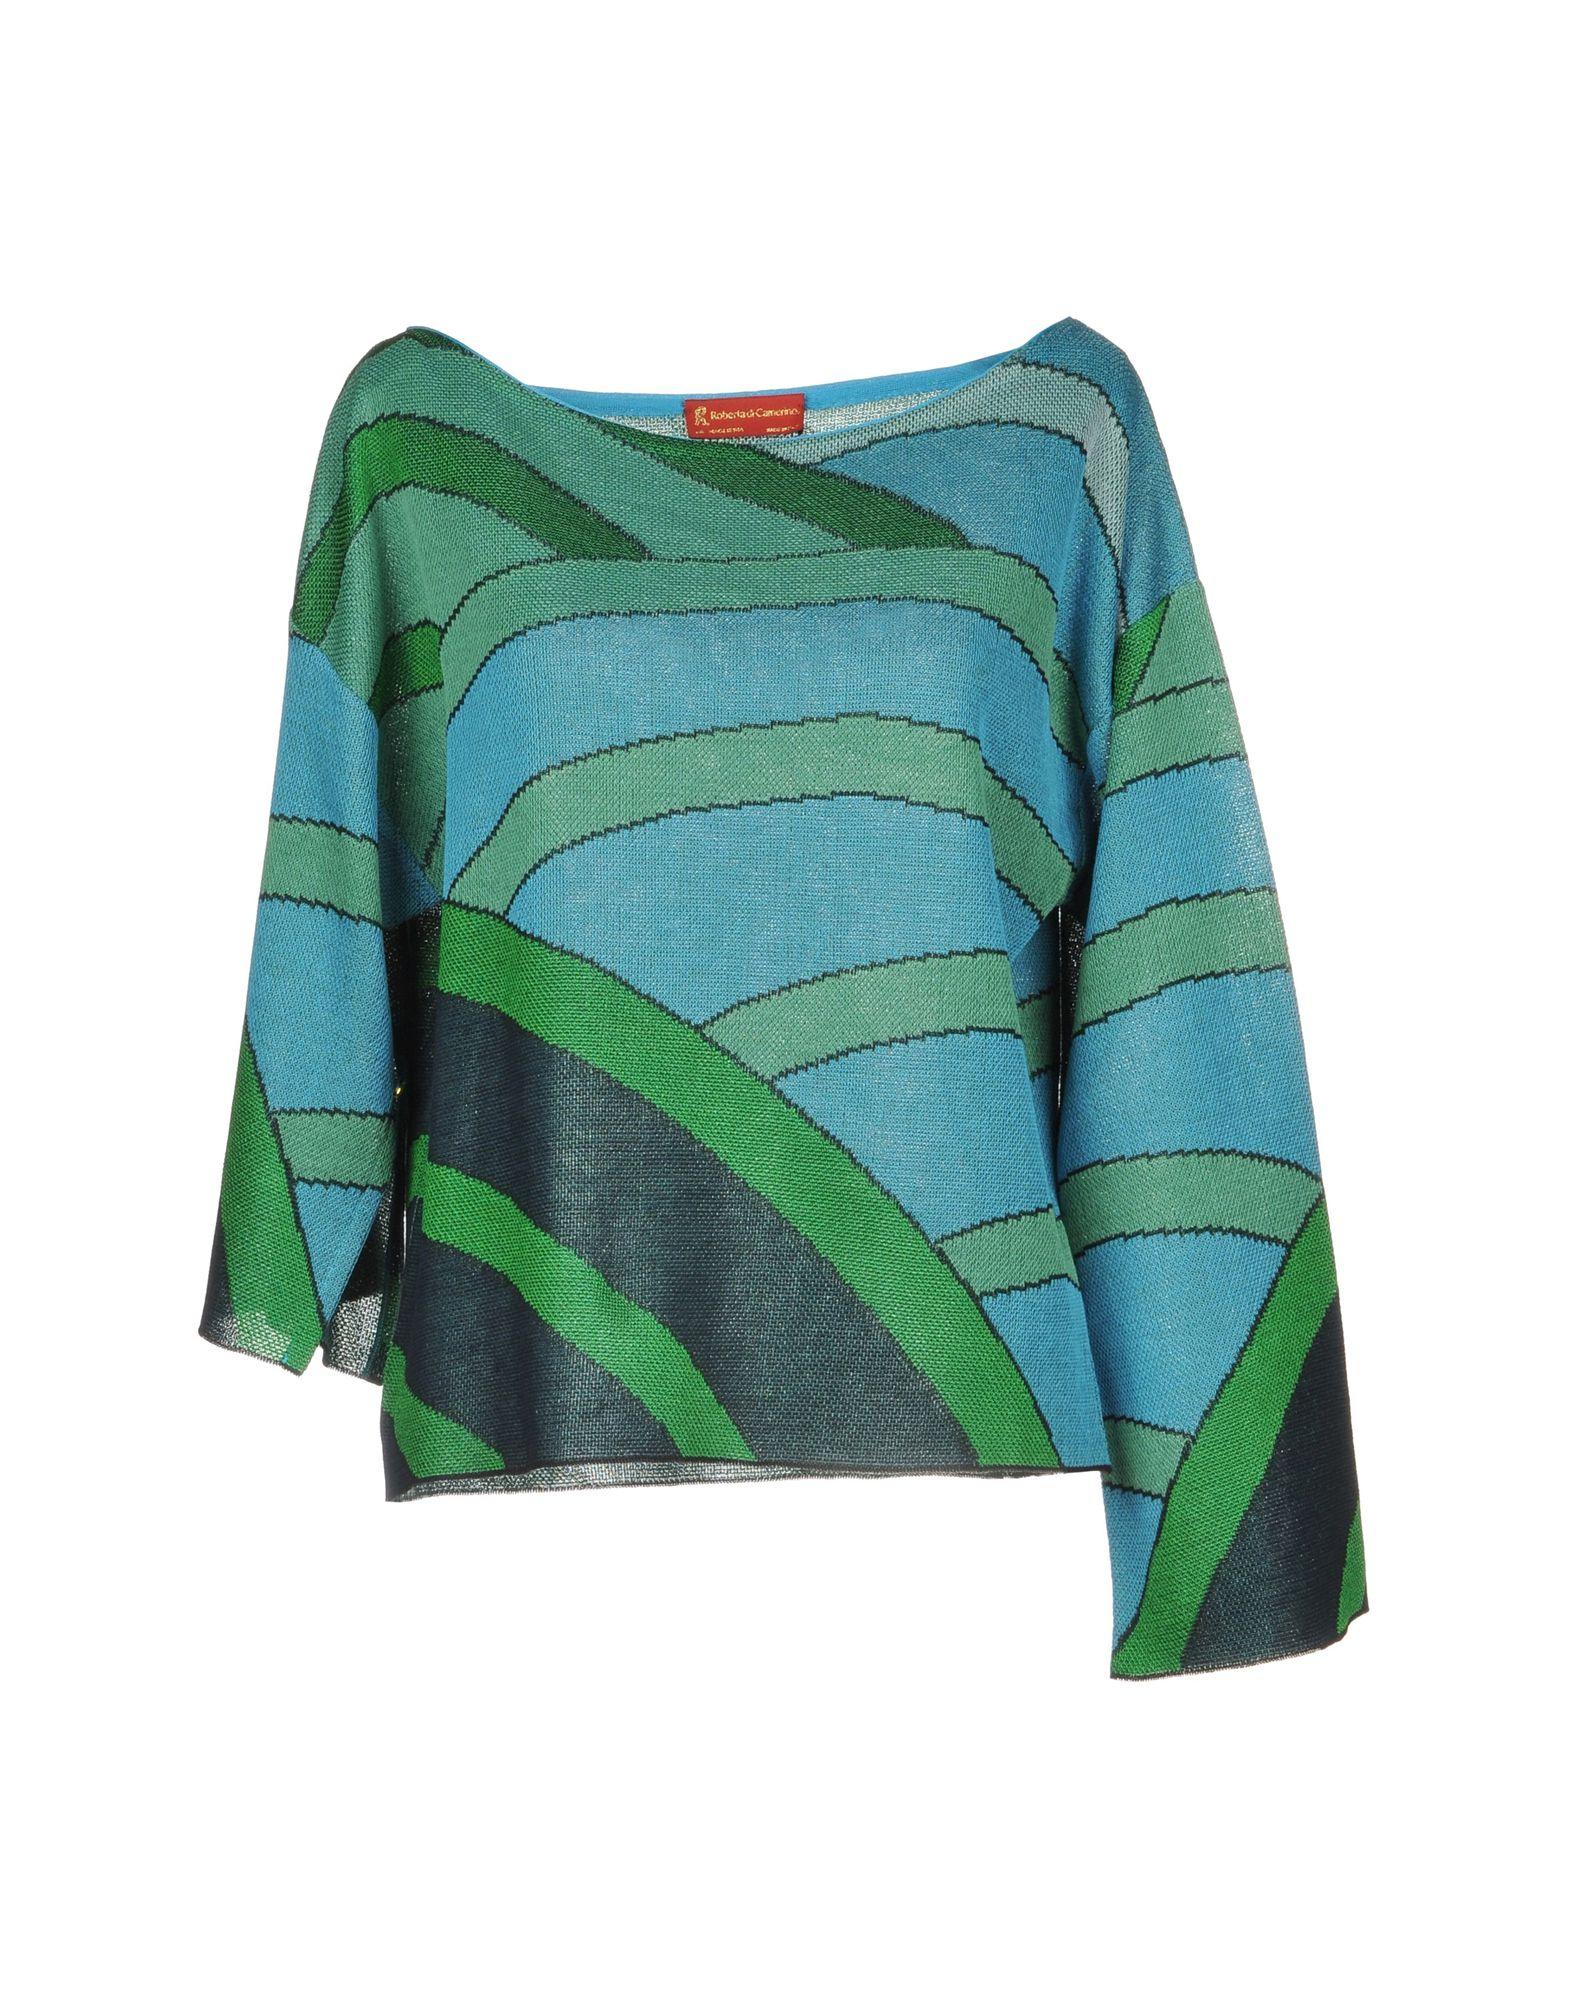 ROBERTA DI CAMERINO Sweater in Pastel Blue